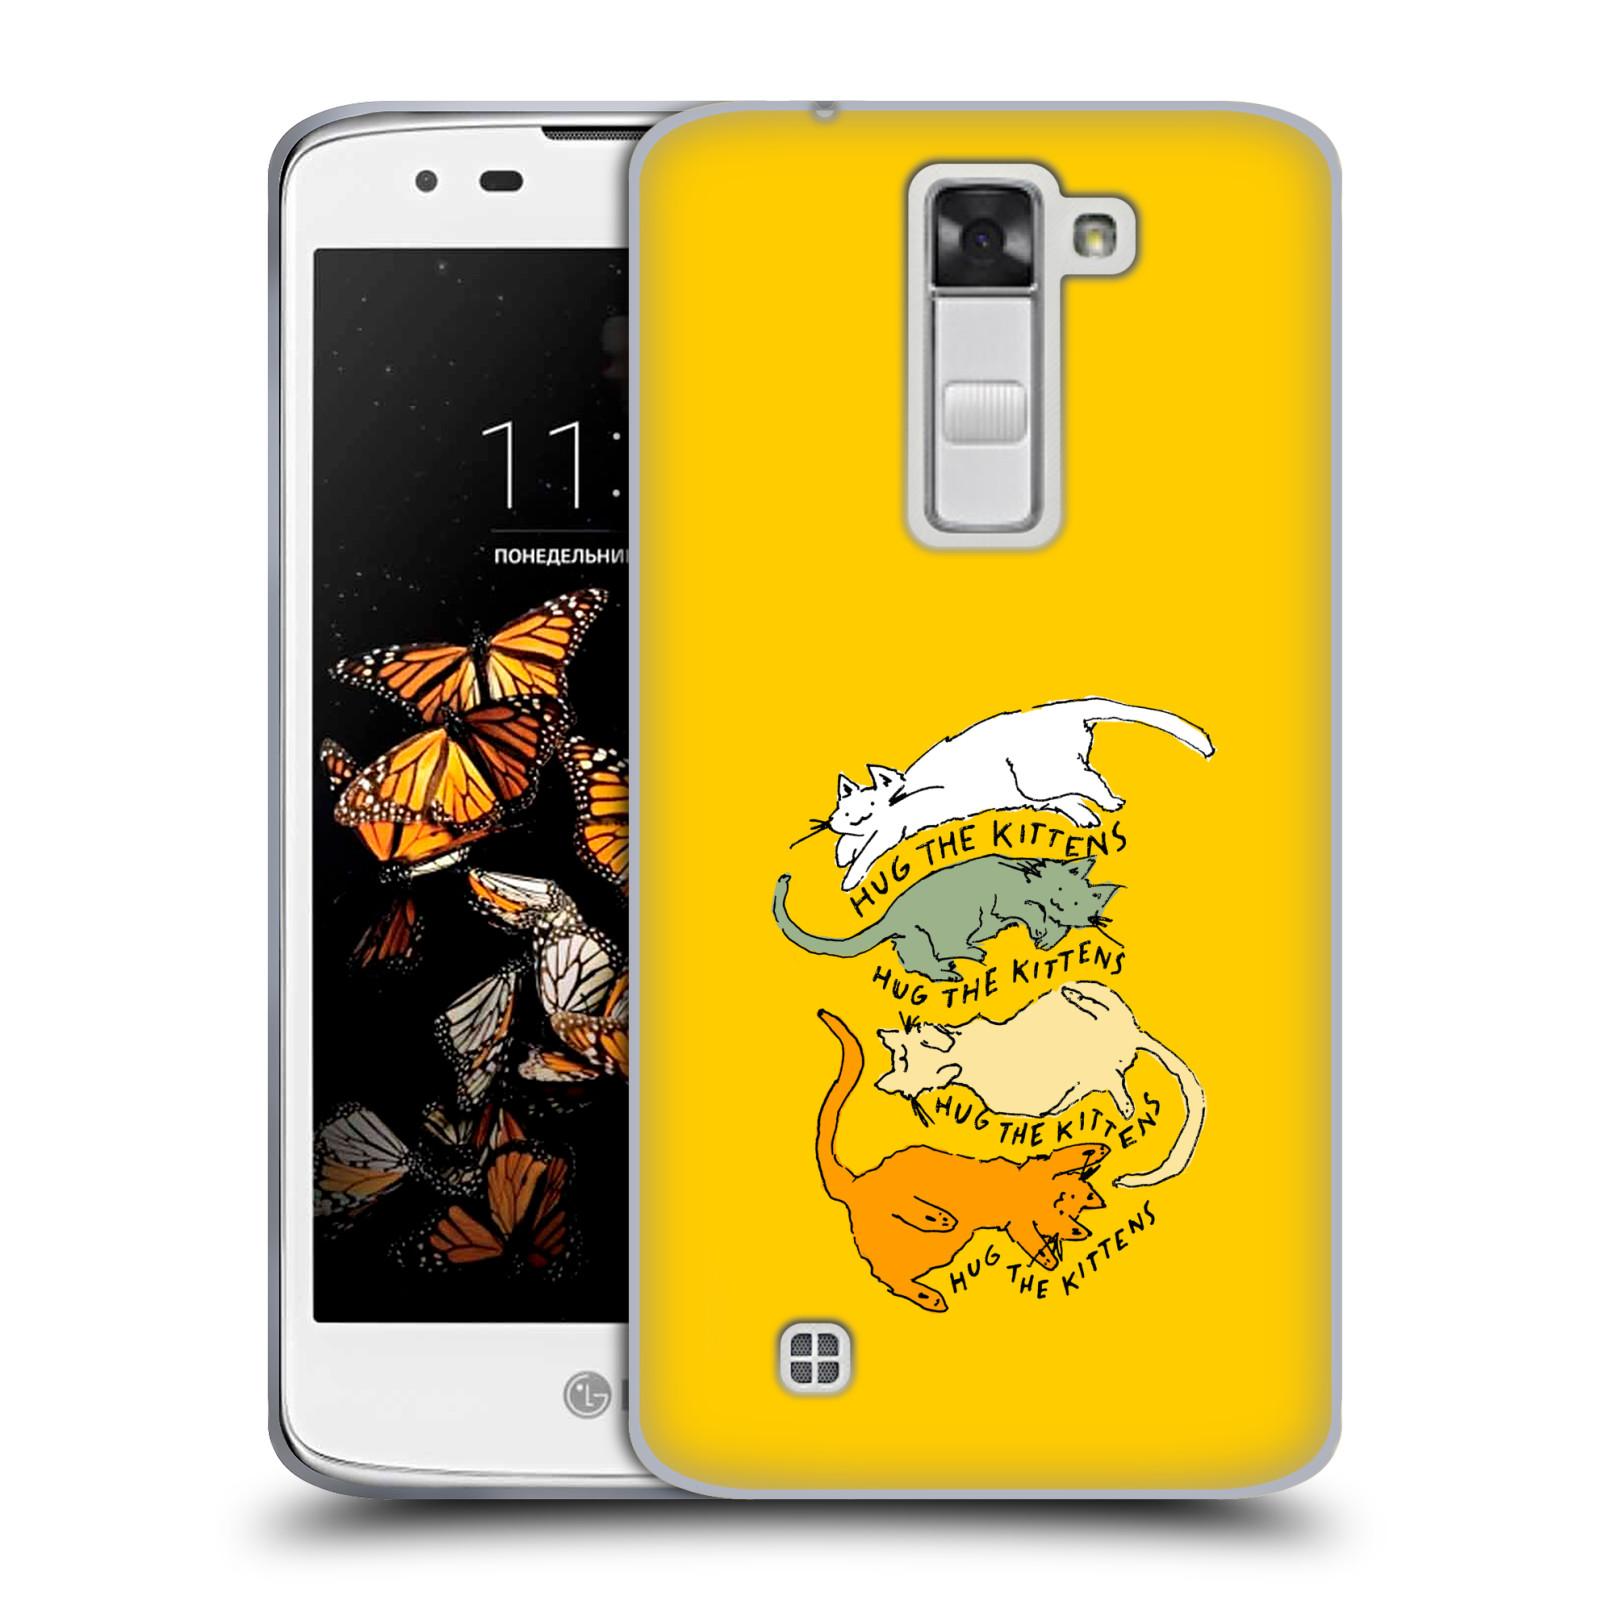 OFFICIAL-KITTEN-RAIN-CATS-SOFT-GEL-CASE-FOR-LG-PHONES-2